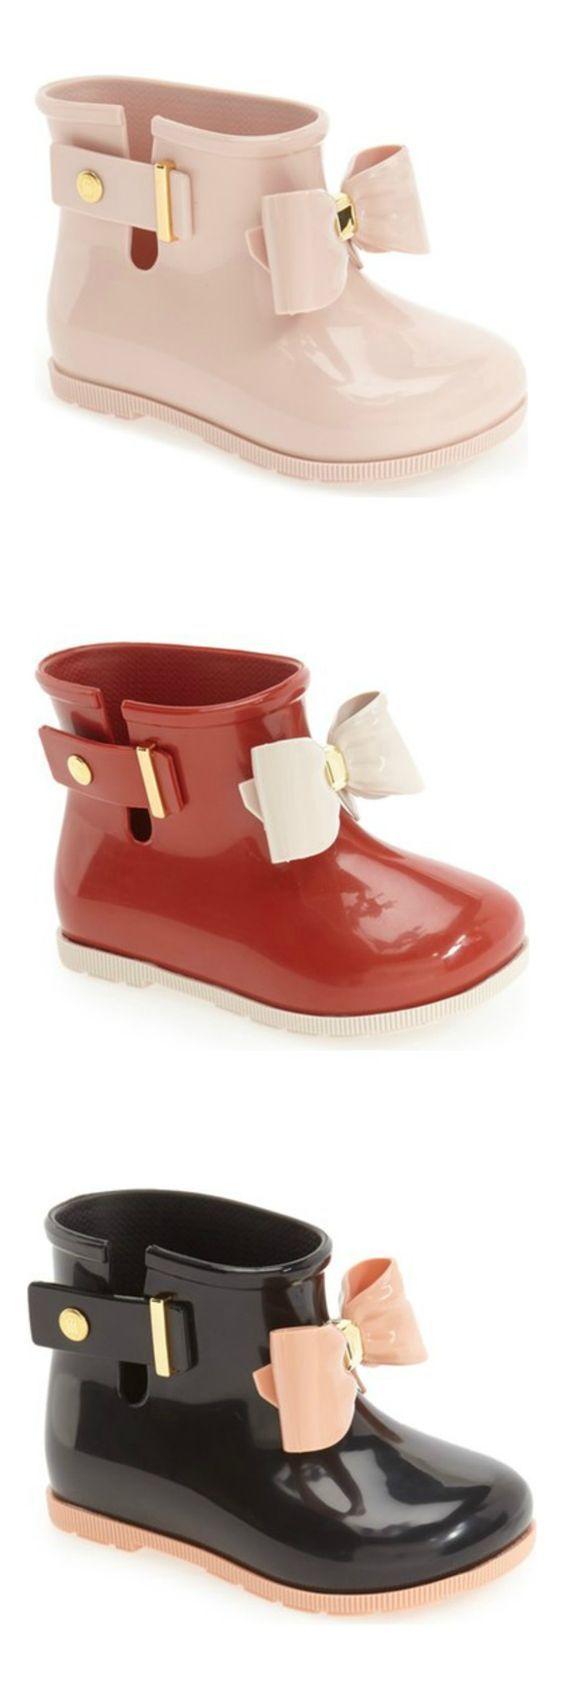 rain boots - way too cute!                                                                                                                                                                                 More #babykidclothesandideas